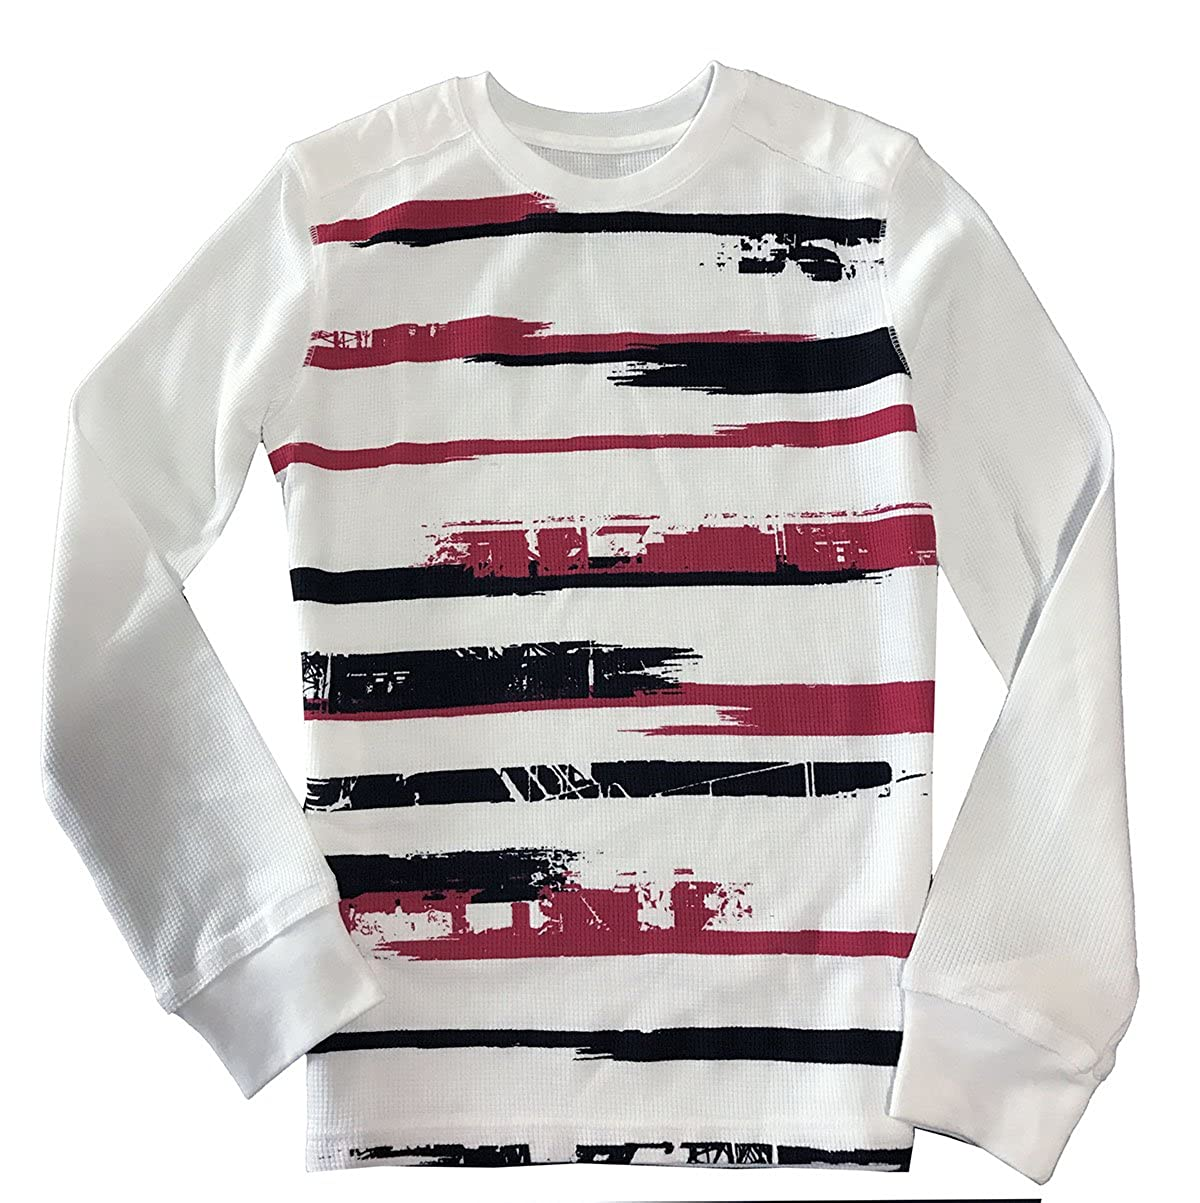 53249e28d Amazon.com: Epic Threads Boys' Long-Sleeve Graffiti Stripe Thermal T-Shirt  Bright White: Clothing